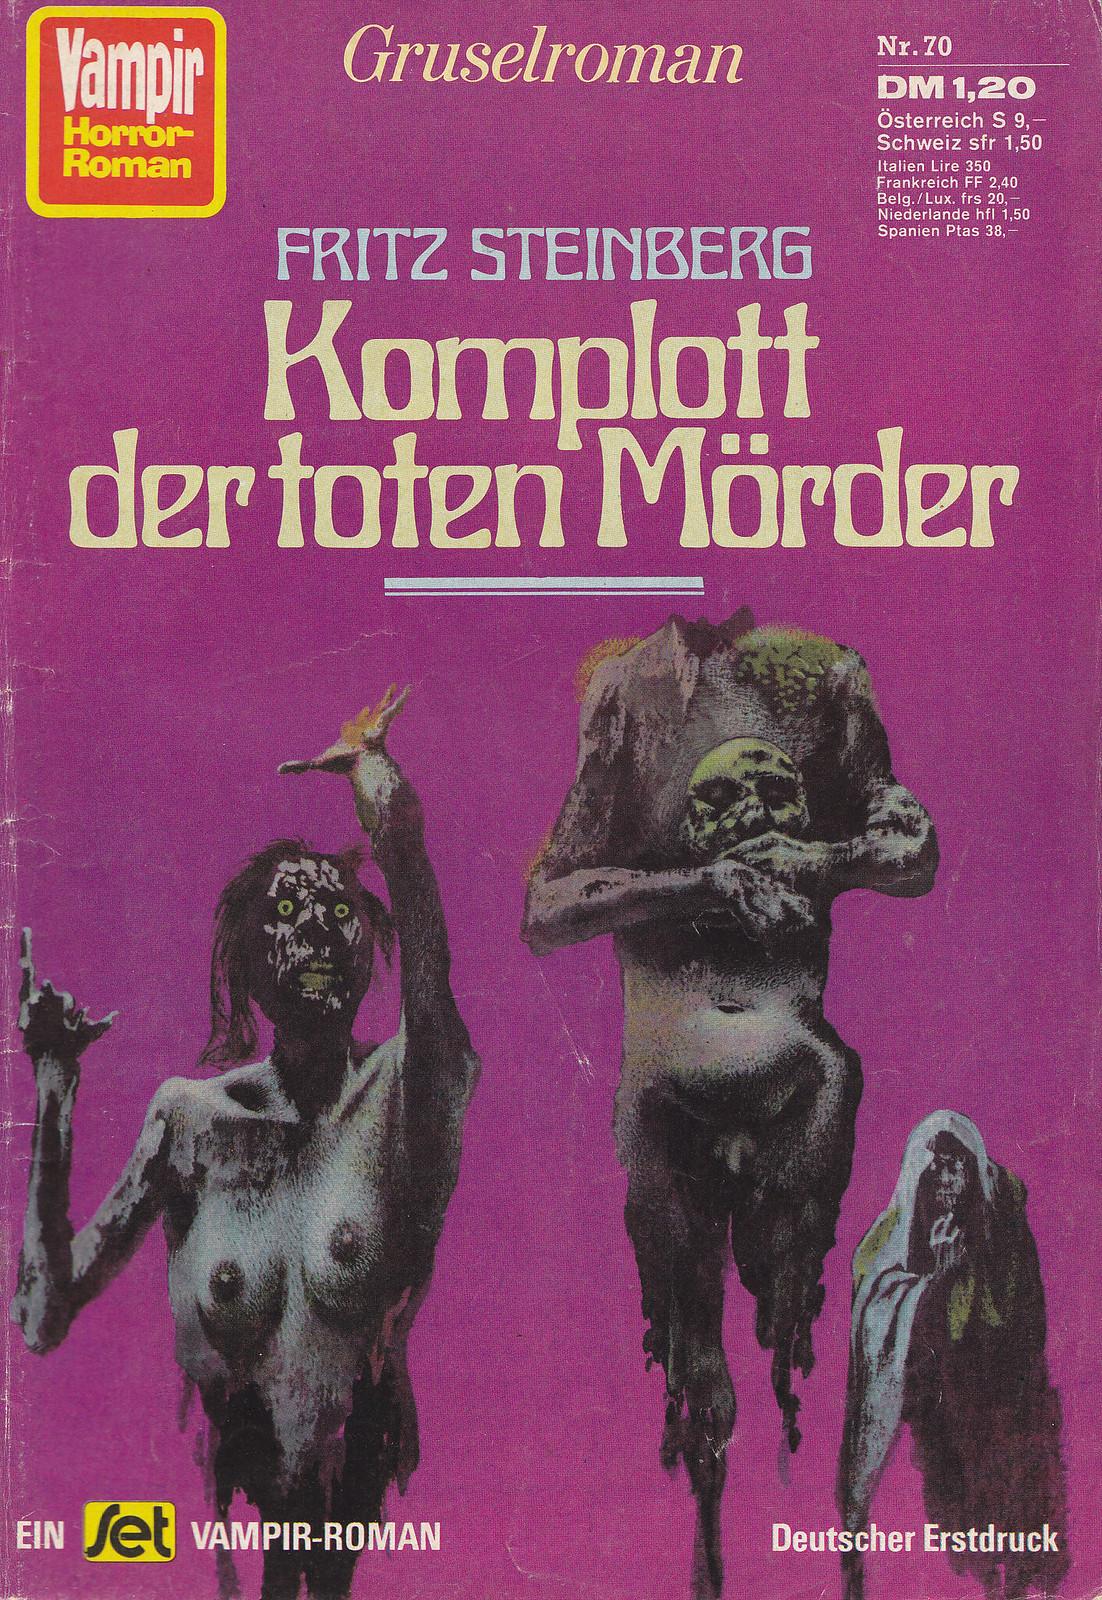 Karel Thole - Vampir Horror Roman - 070